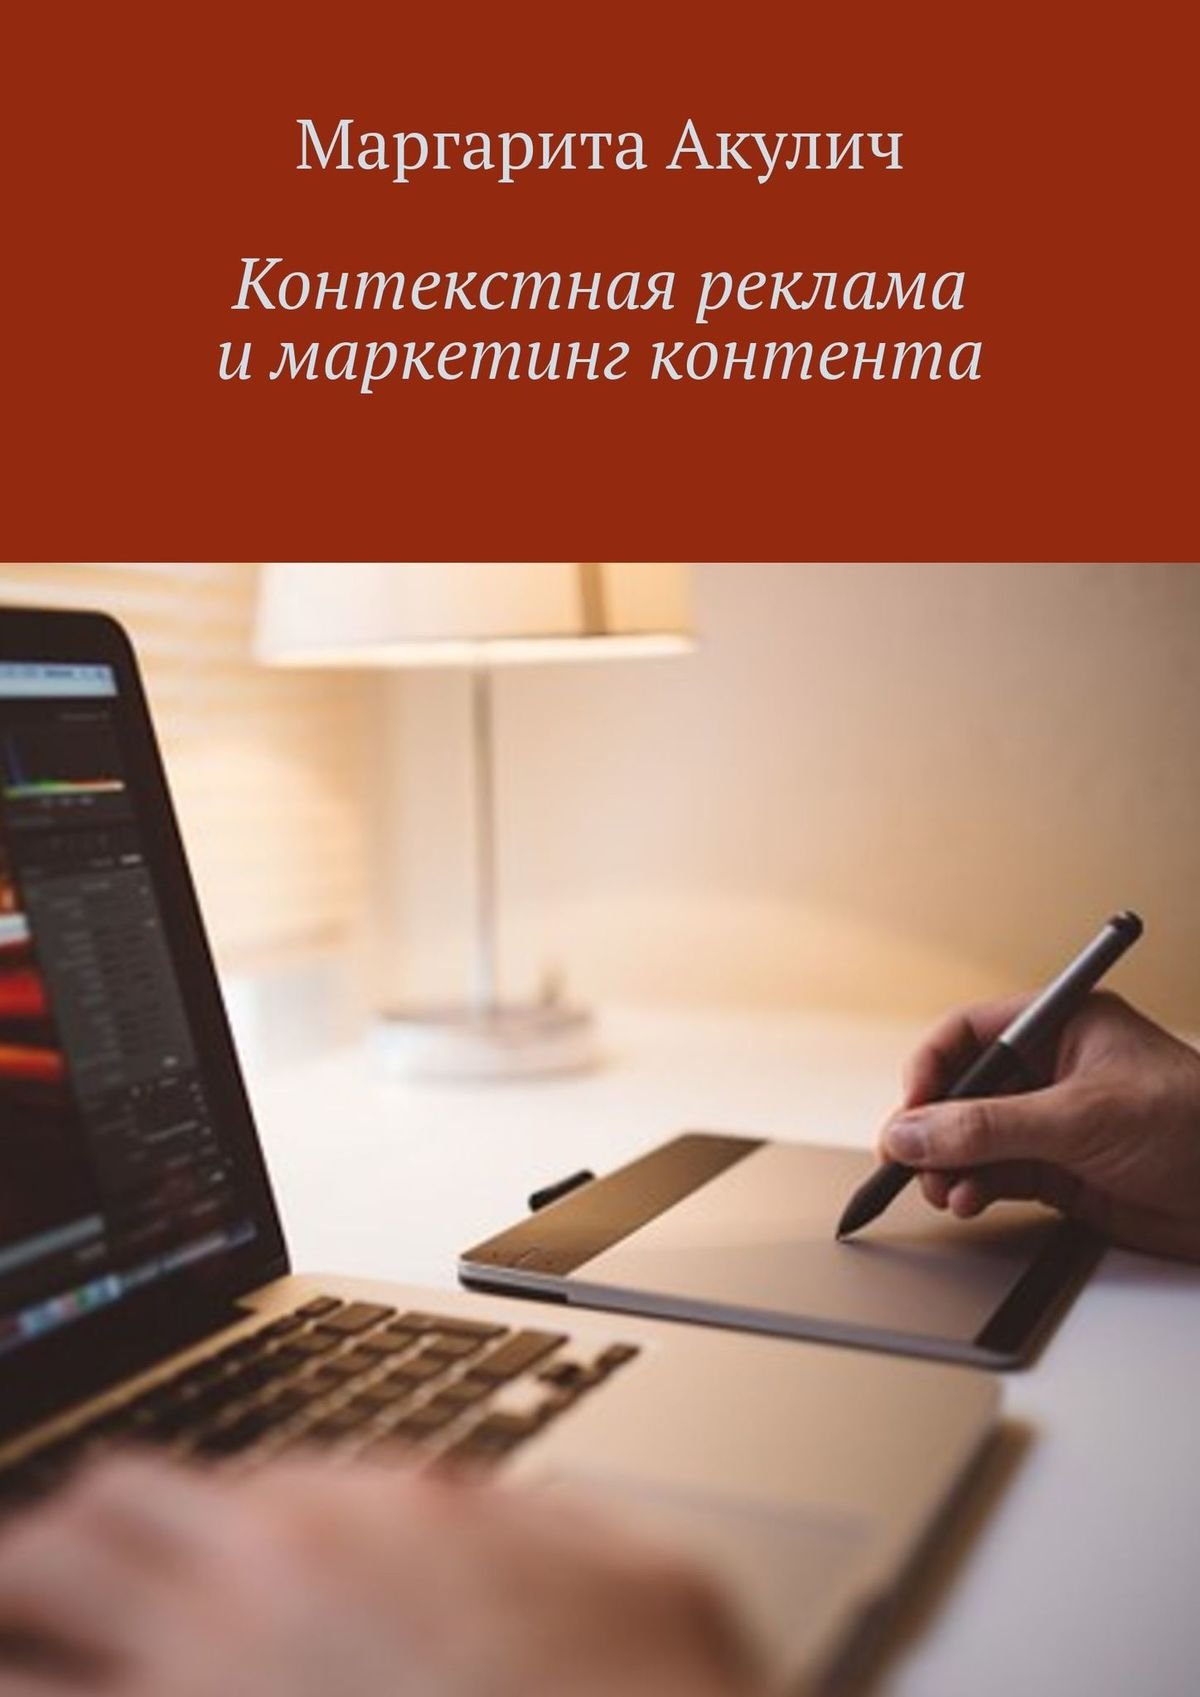 Маргарита Акулич Инструменты интернет-маркетинга. Контекстная реклама имаркетинг контента